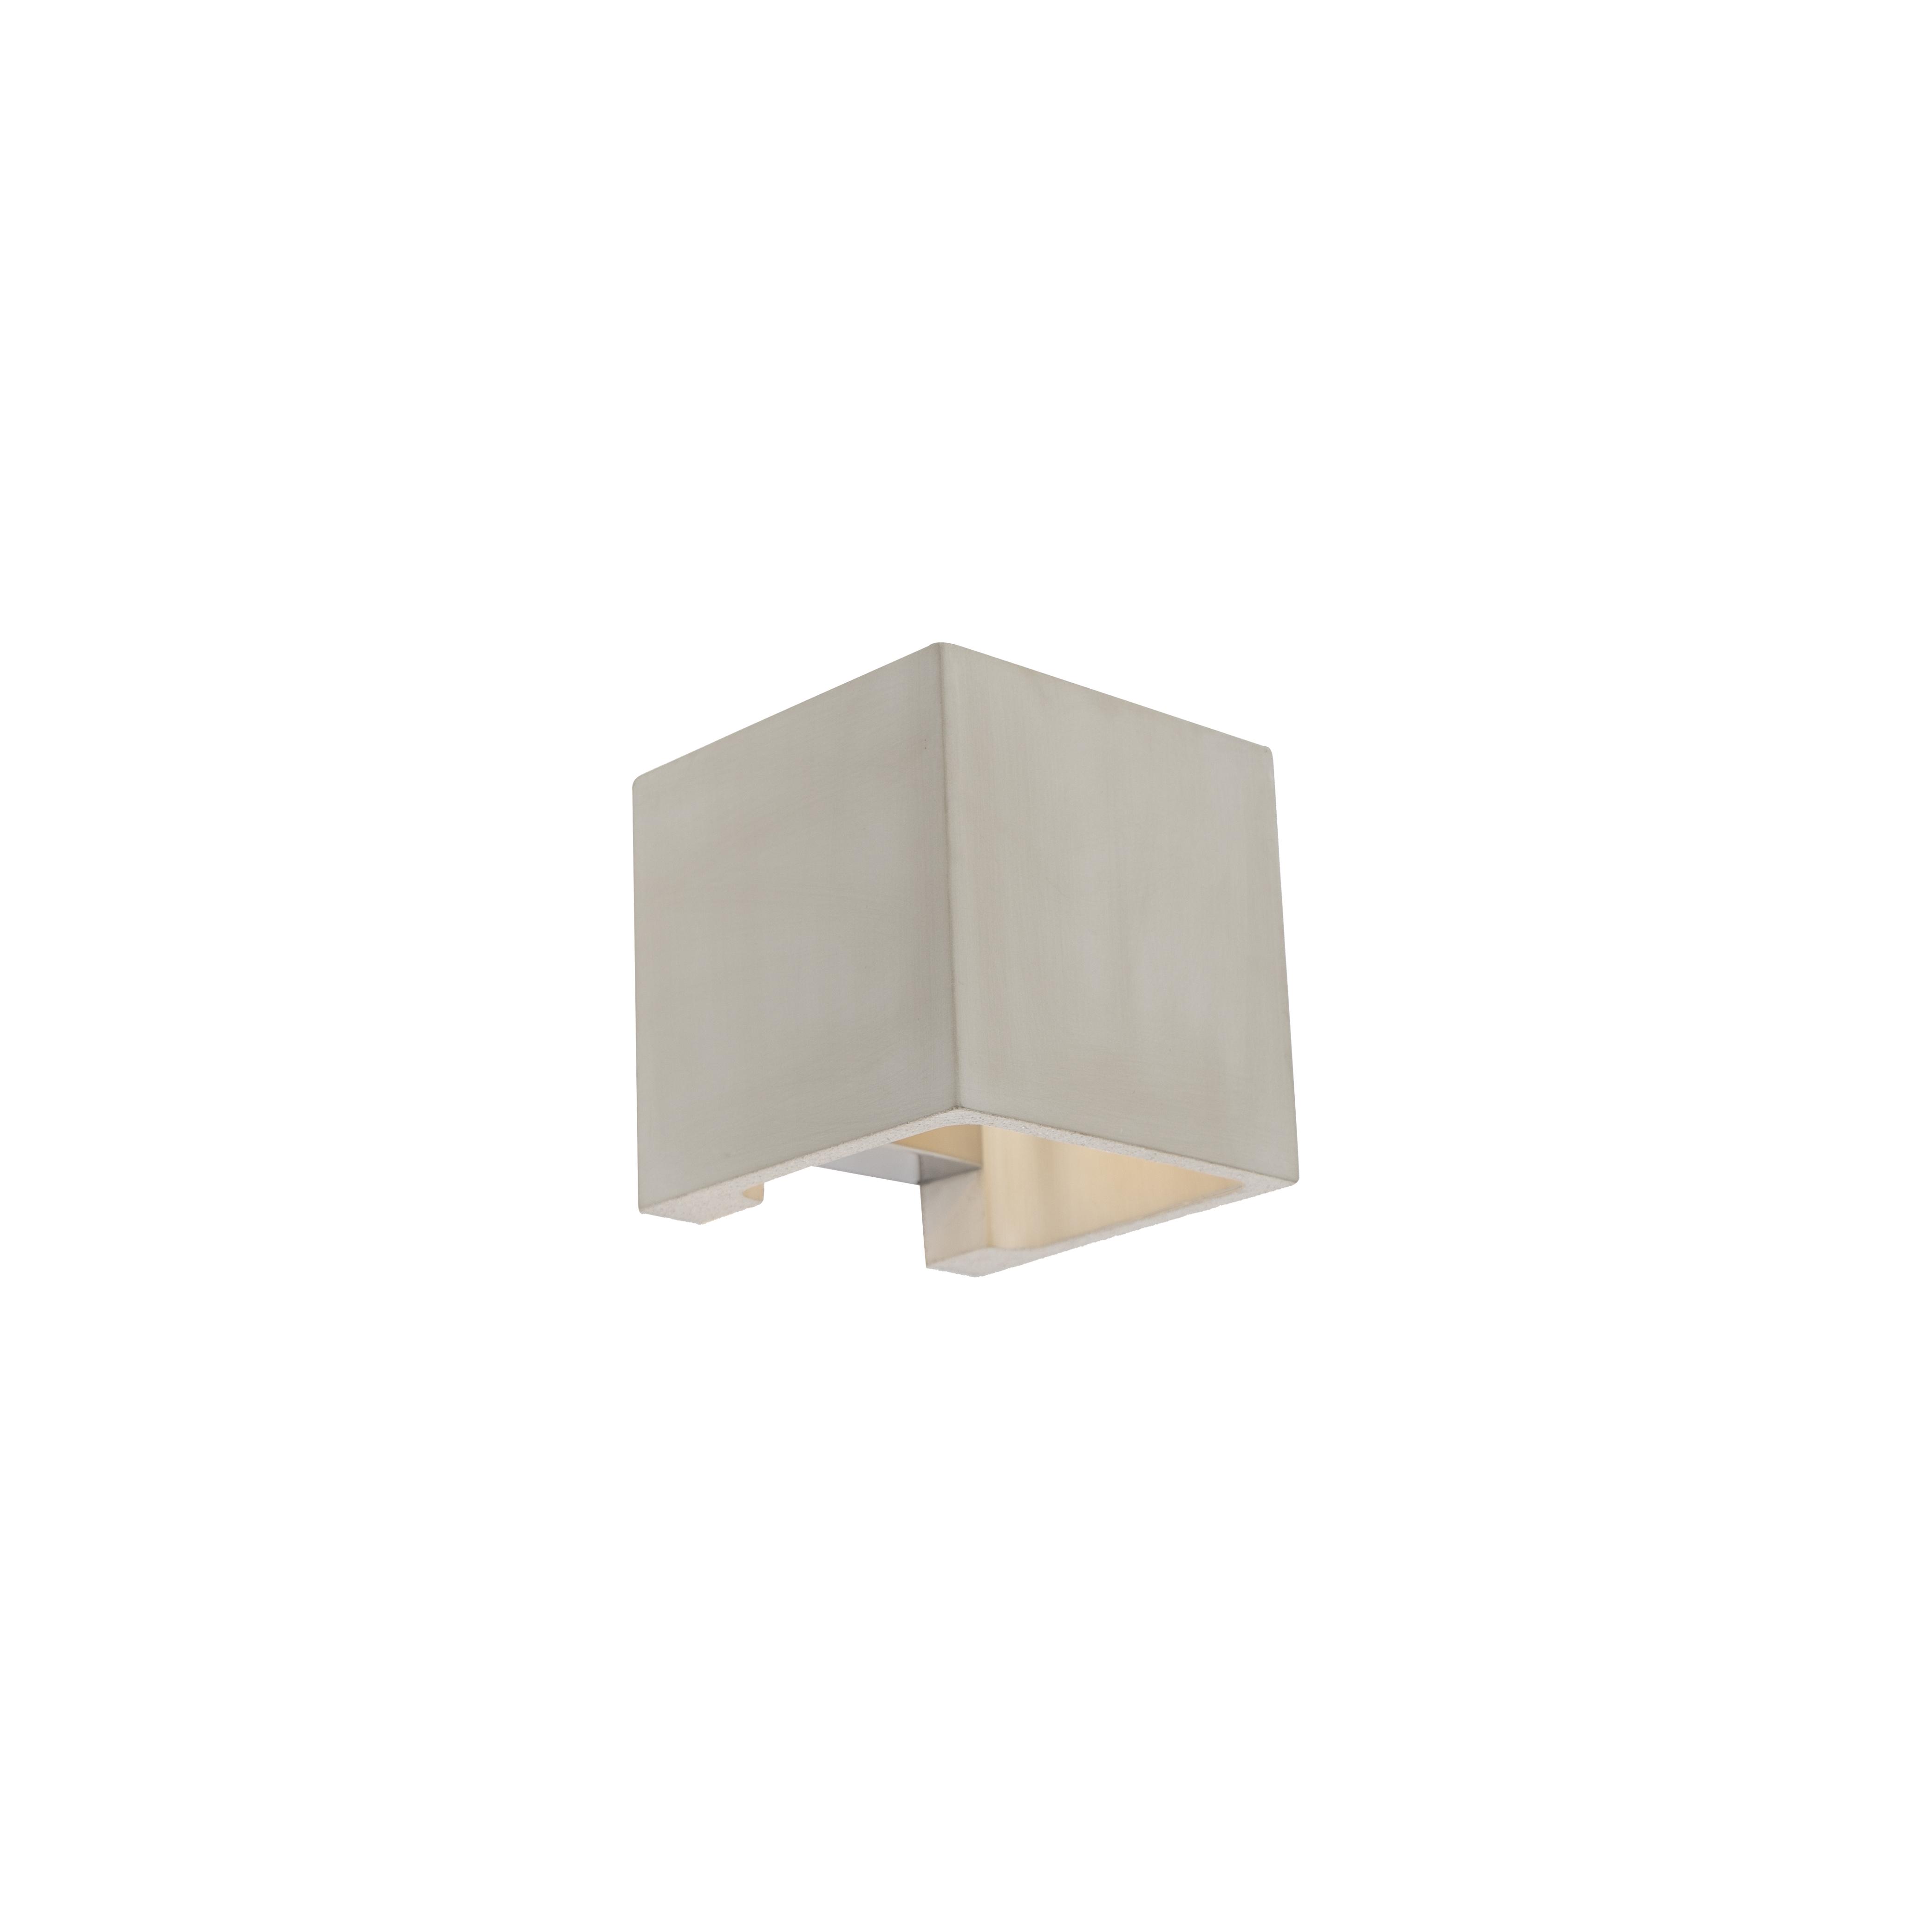 Landelijke vierkante wandlamp beton - Alban